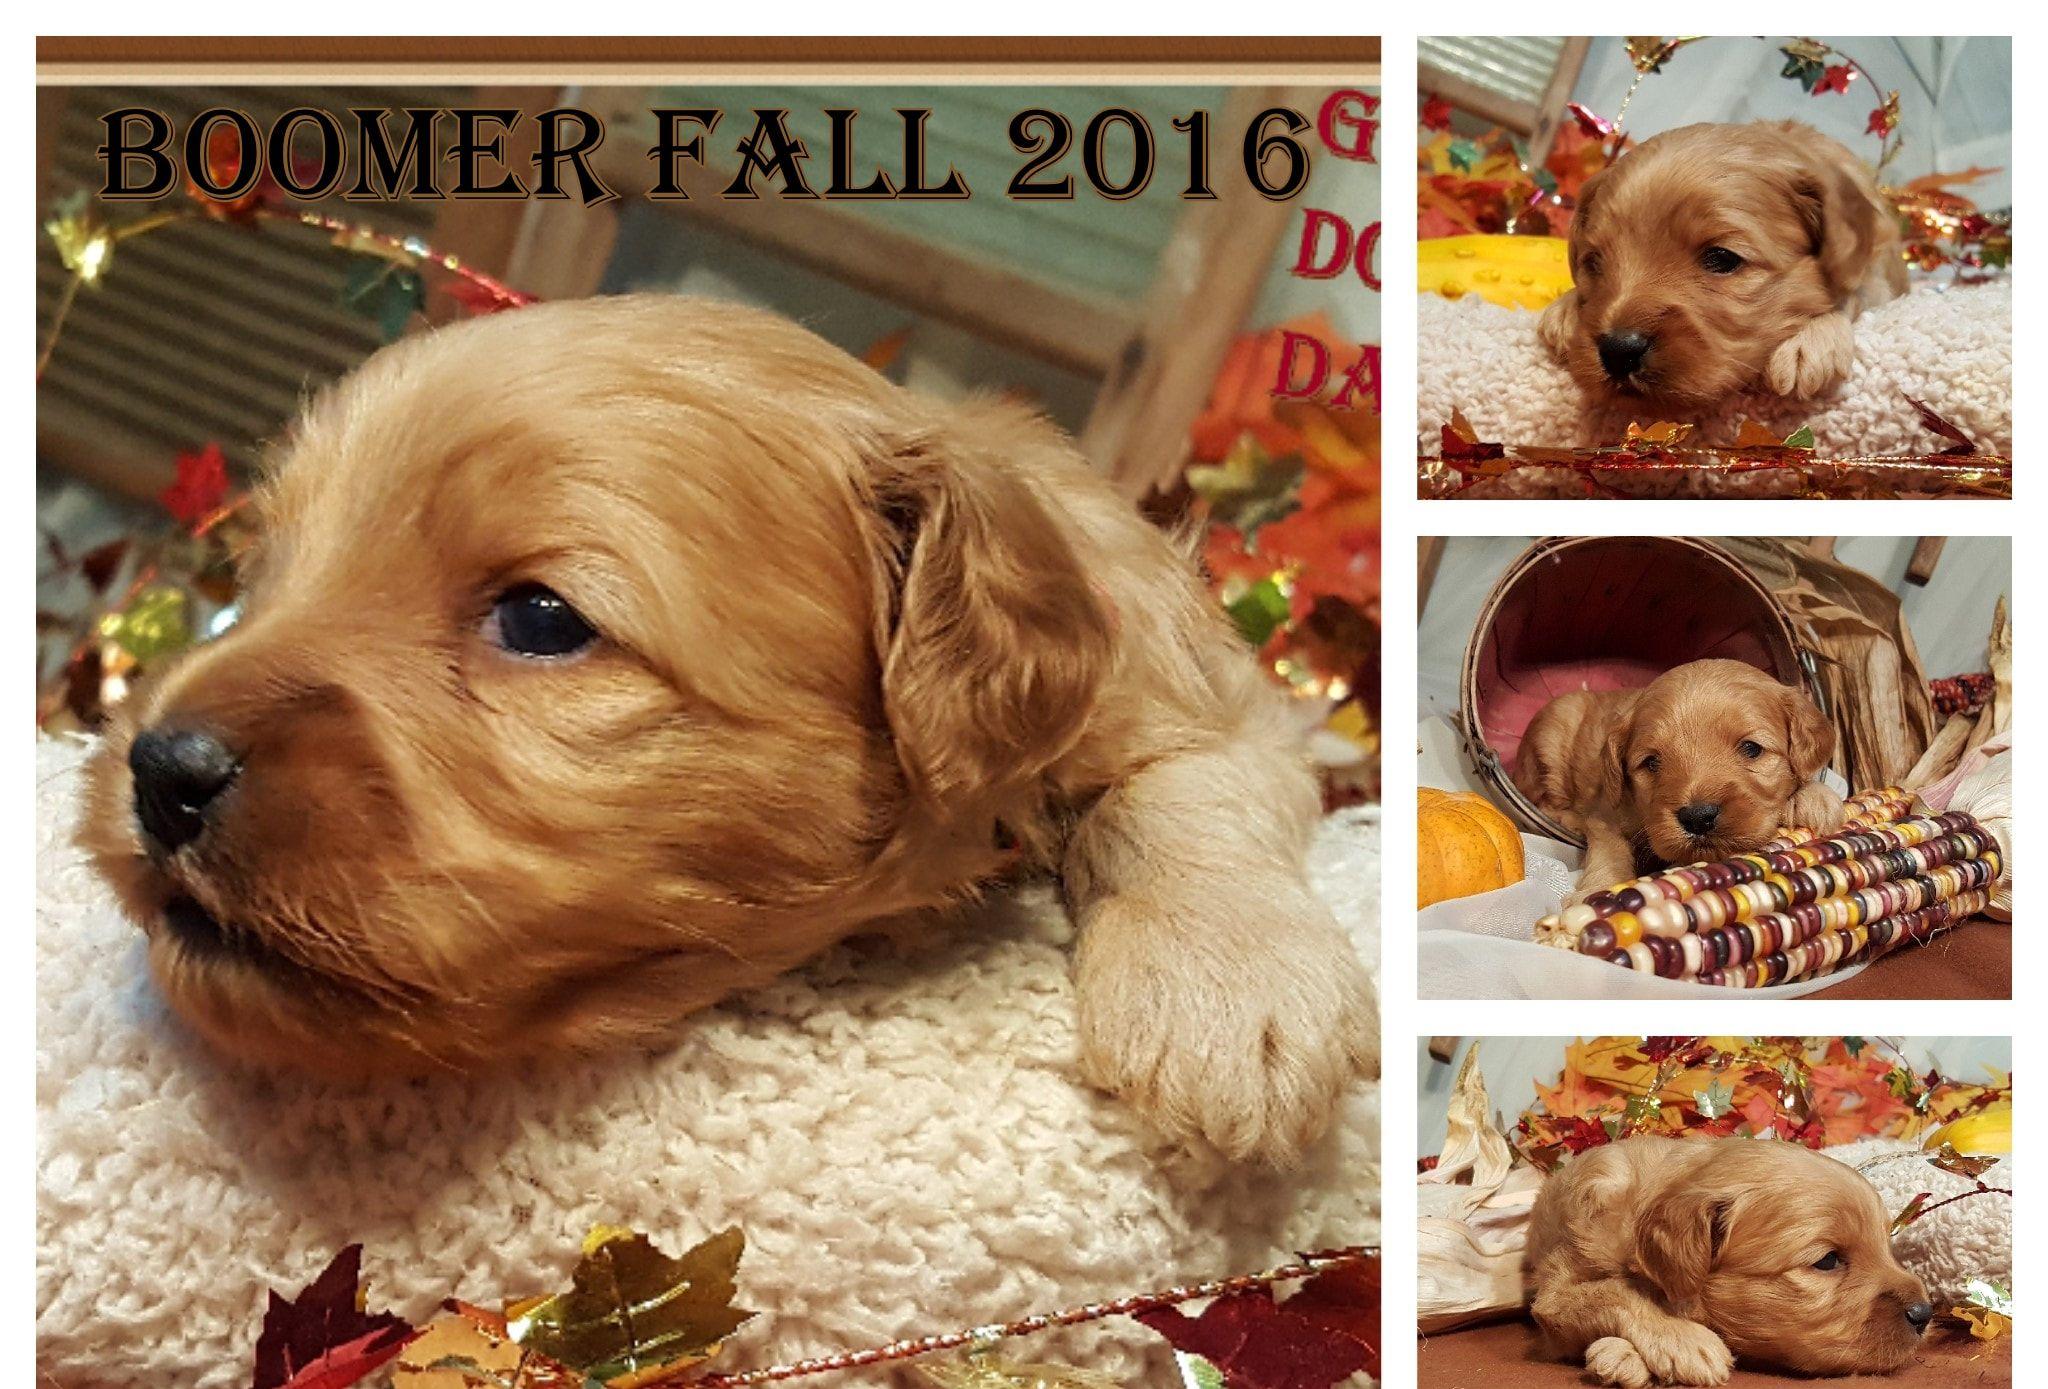 New cavapoo and goldendoodle puppies - Golden Doodle Dandy